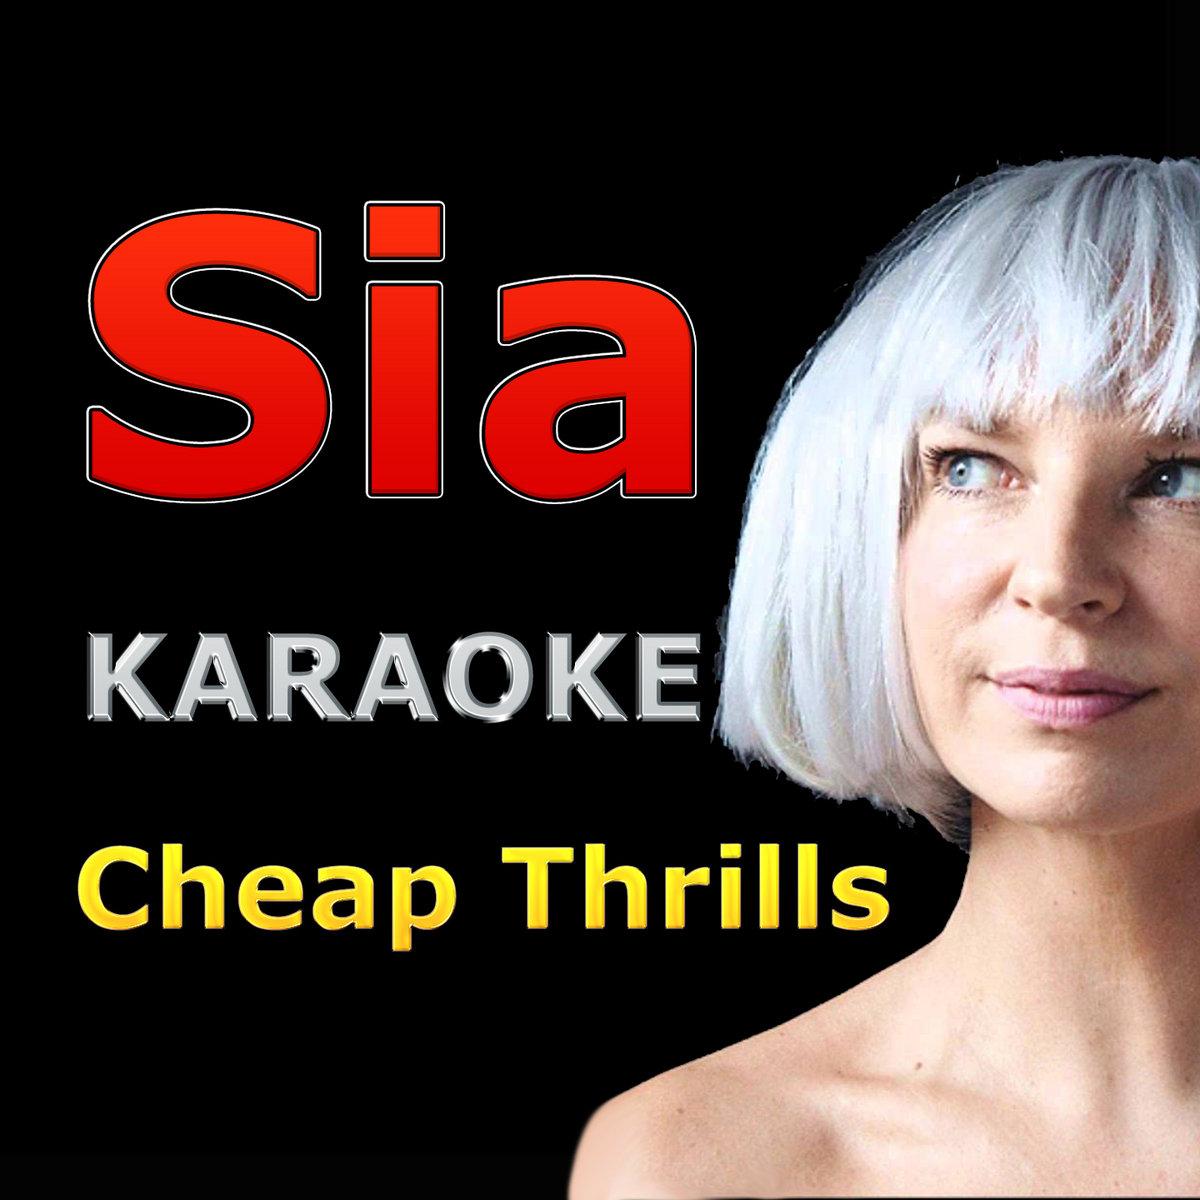 Sia - Cheap Thrills (Karaoke Backing Track)   More Than Rock